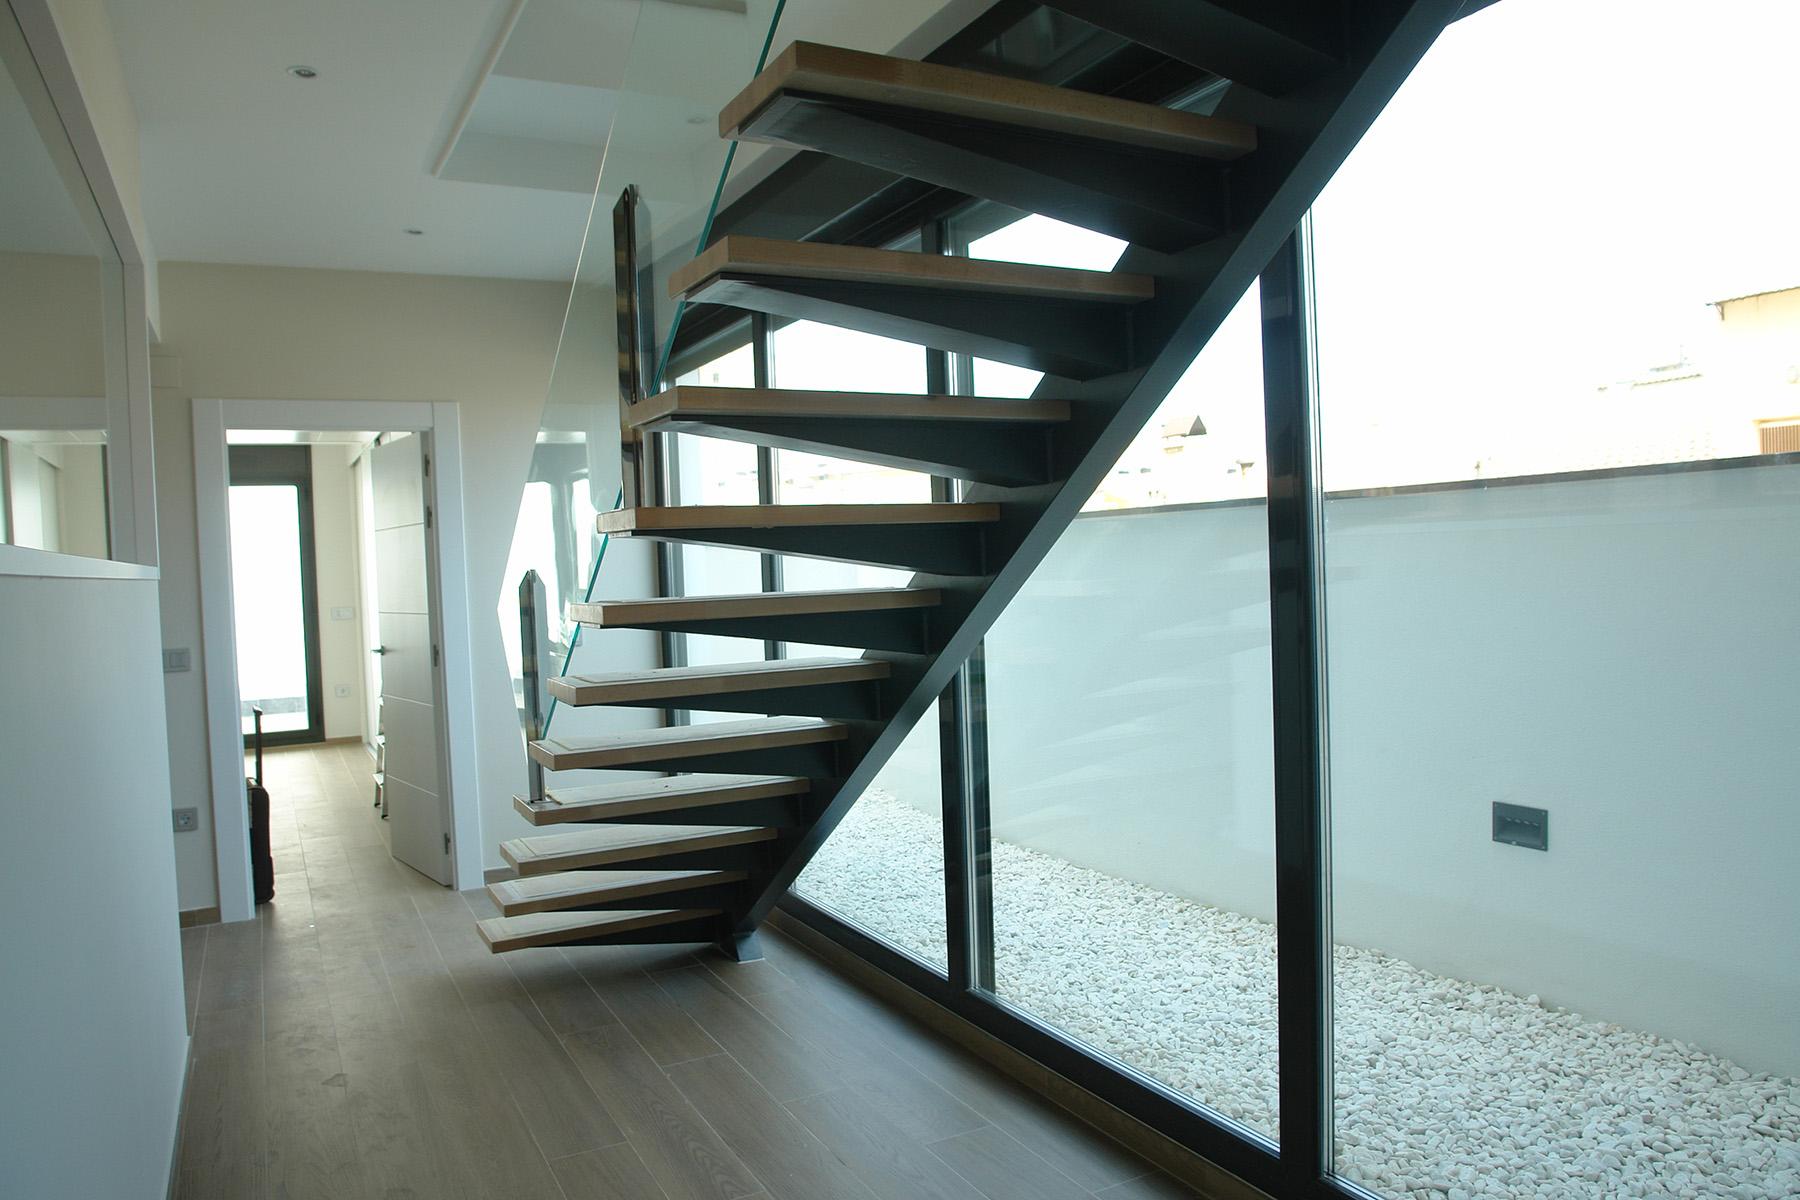 Galeria Casa en Binéfar, Huesca - 11 ?>